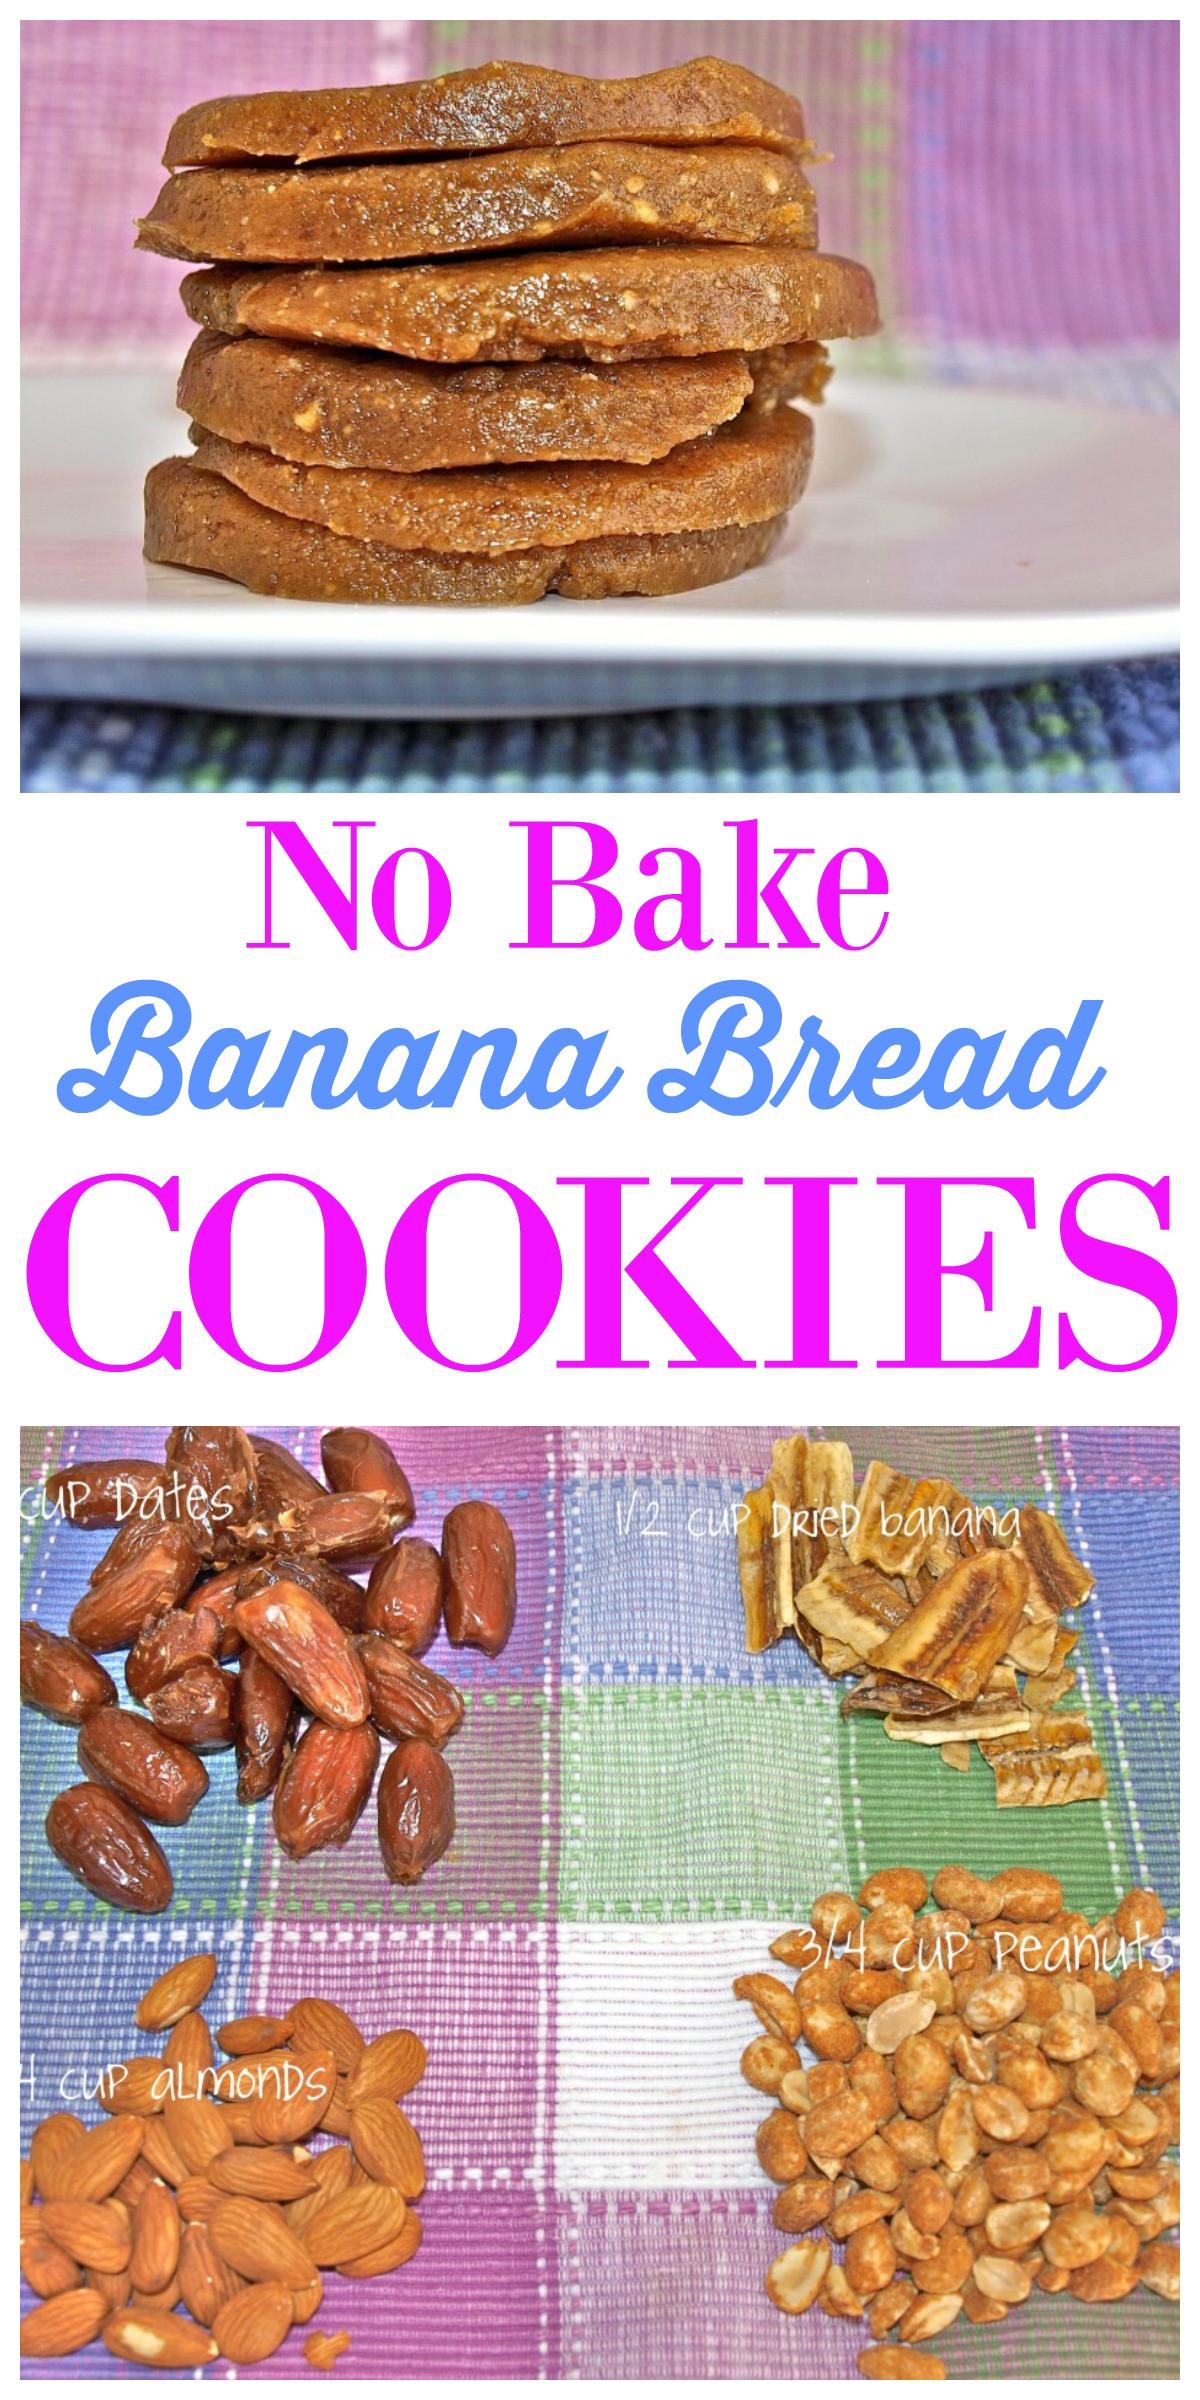 Healthy No Bake Cookies With Banana  Raw Banana Bread Cookies Happy Healthy Mama